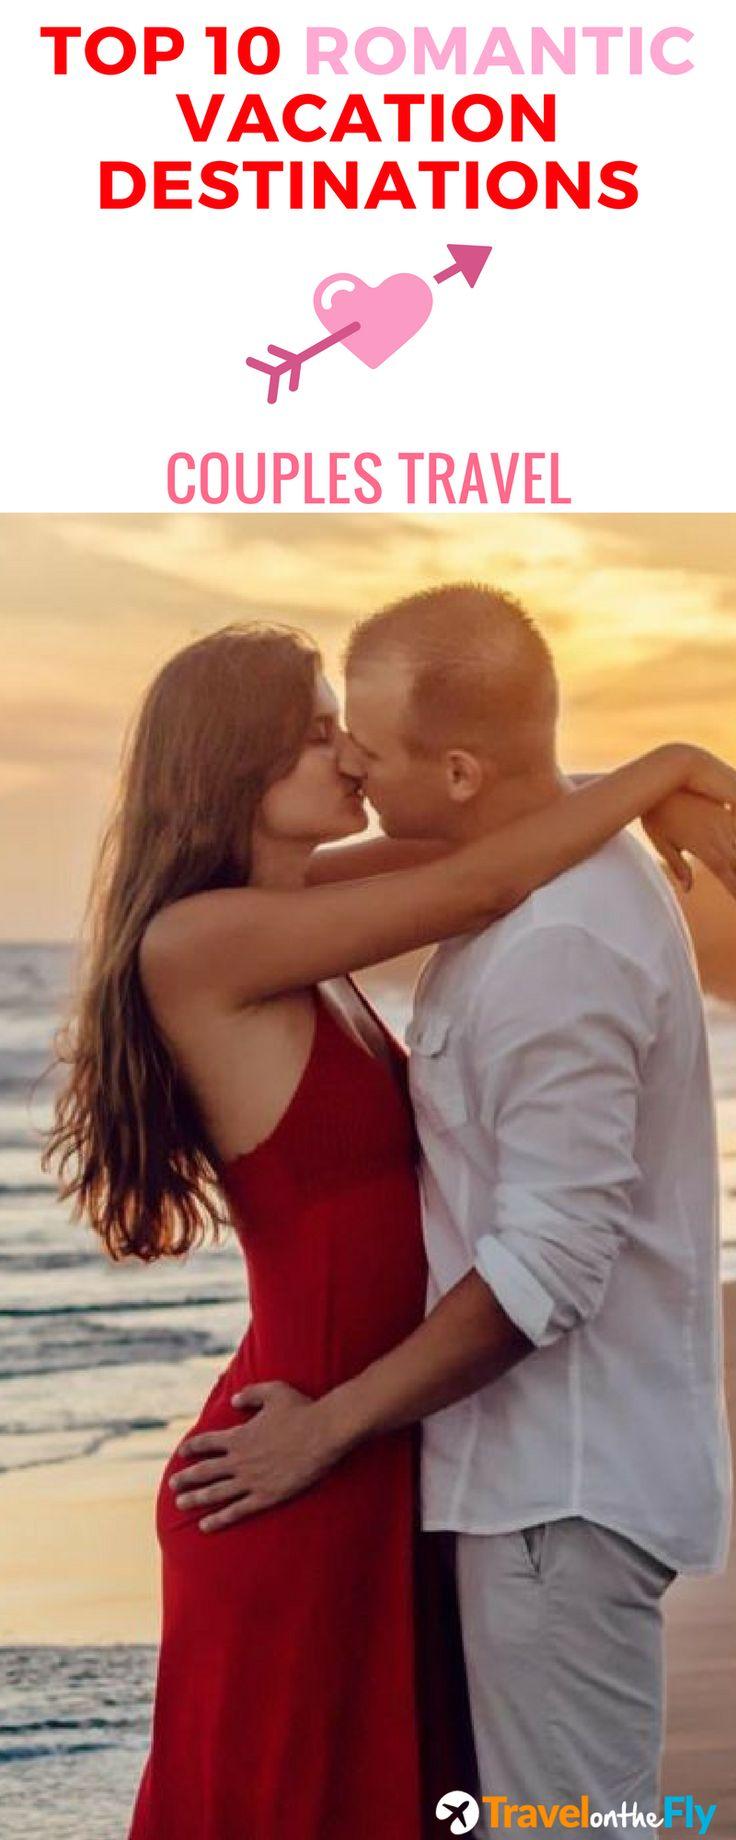 Romantic Travel Destinations - Couples Travel Romantic Vacation and Romantic Travel Spots for couples.